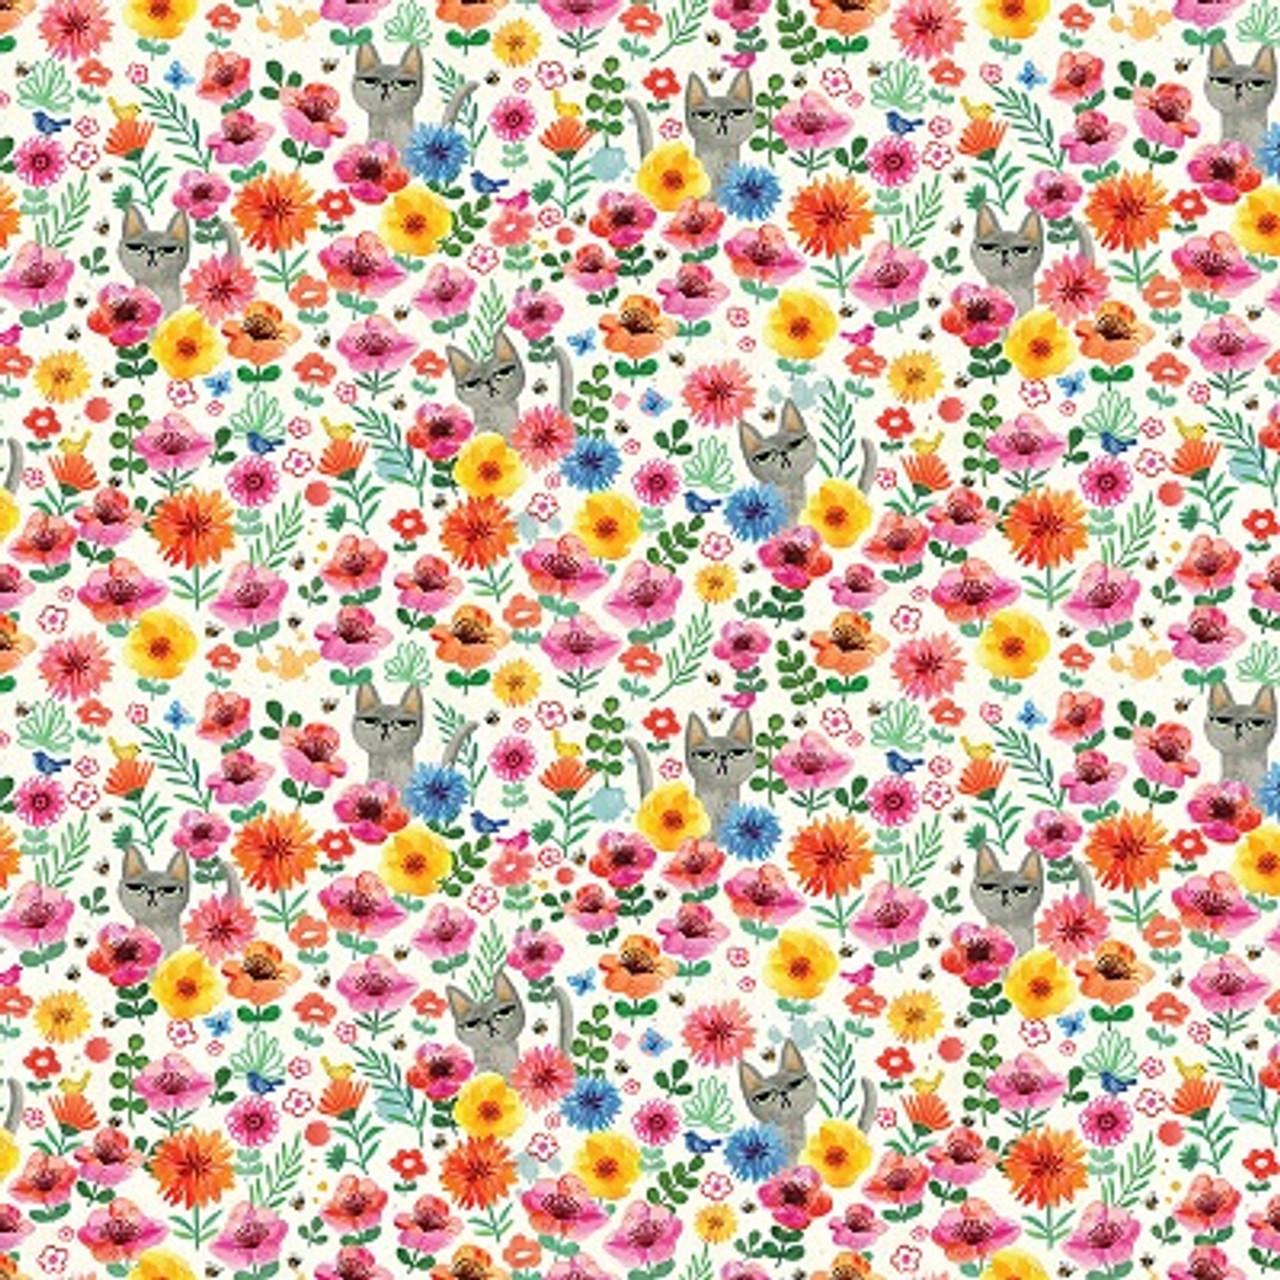 Dear Stella SALE 100/% Cotton Fabric Garden Party Lawn Chairs Deck